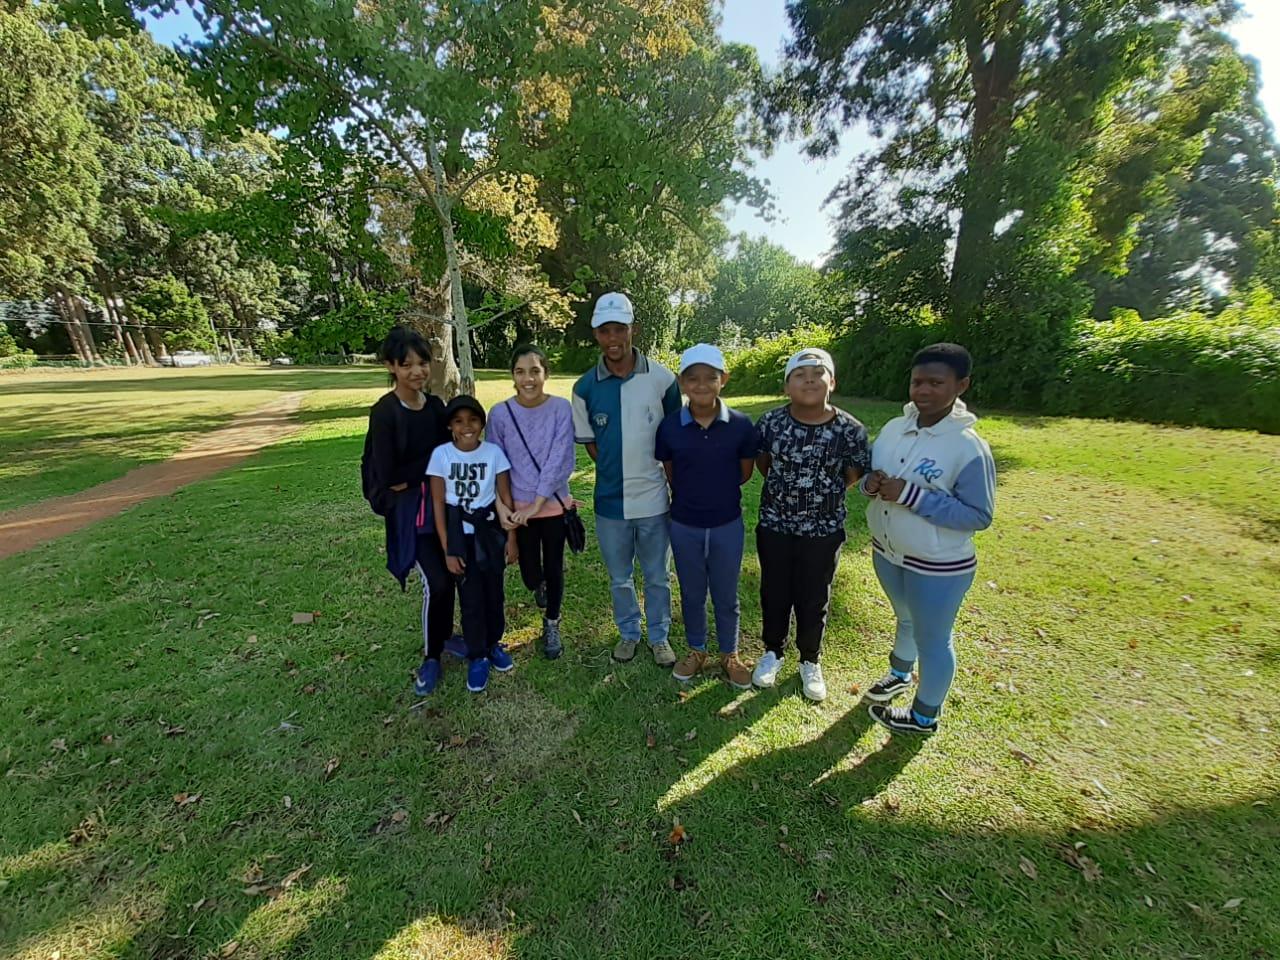 Floreat visit to Kirstenbosch February 2020